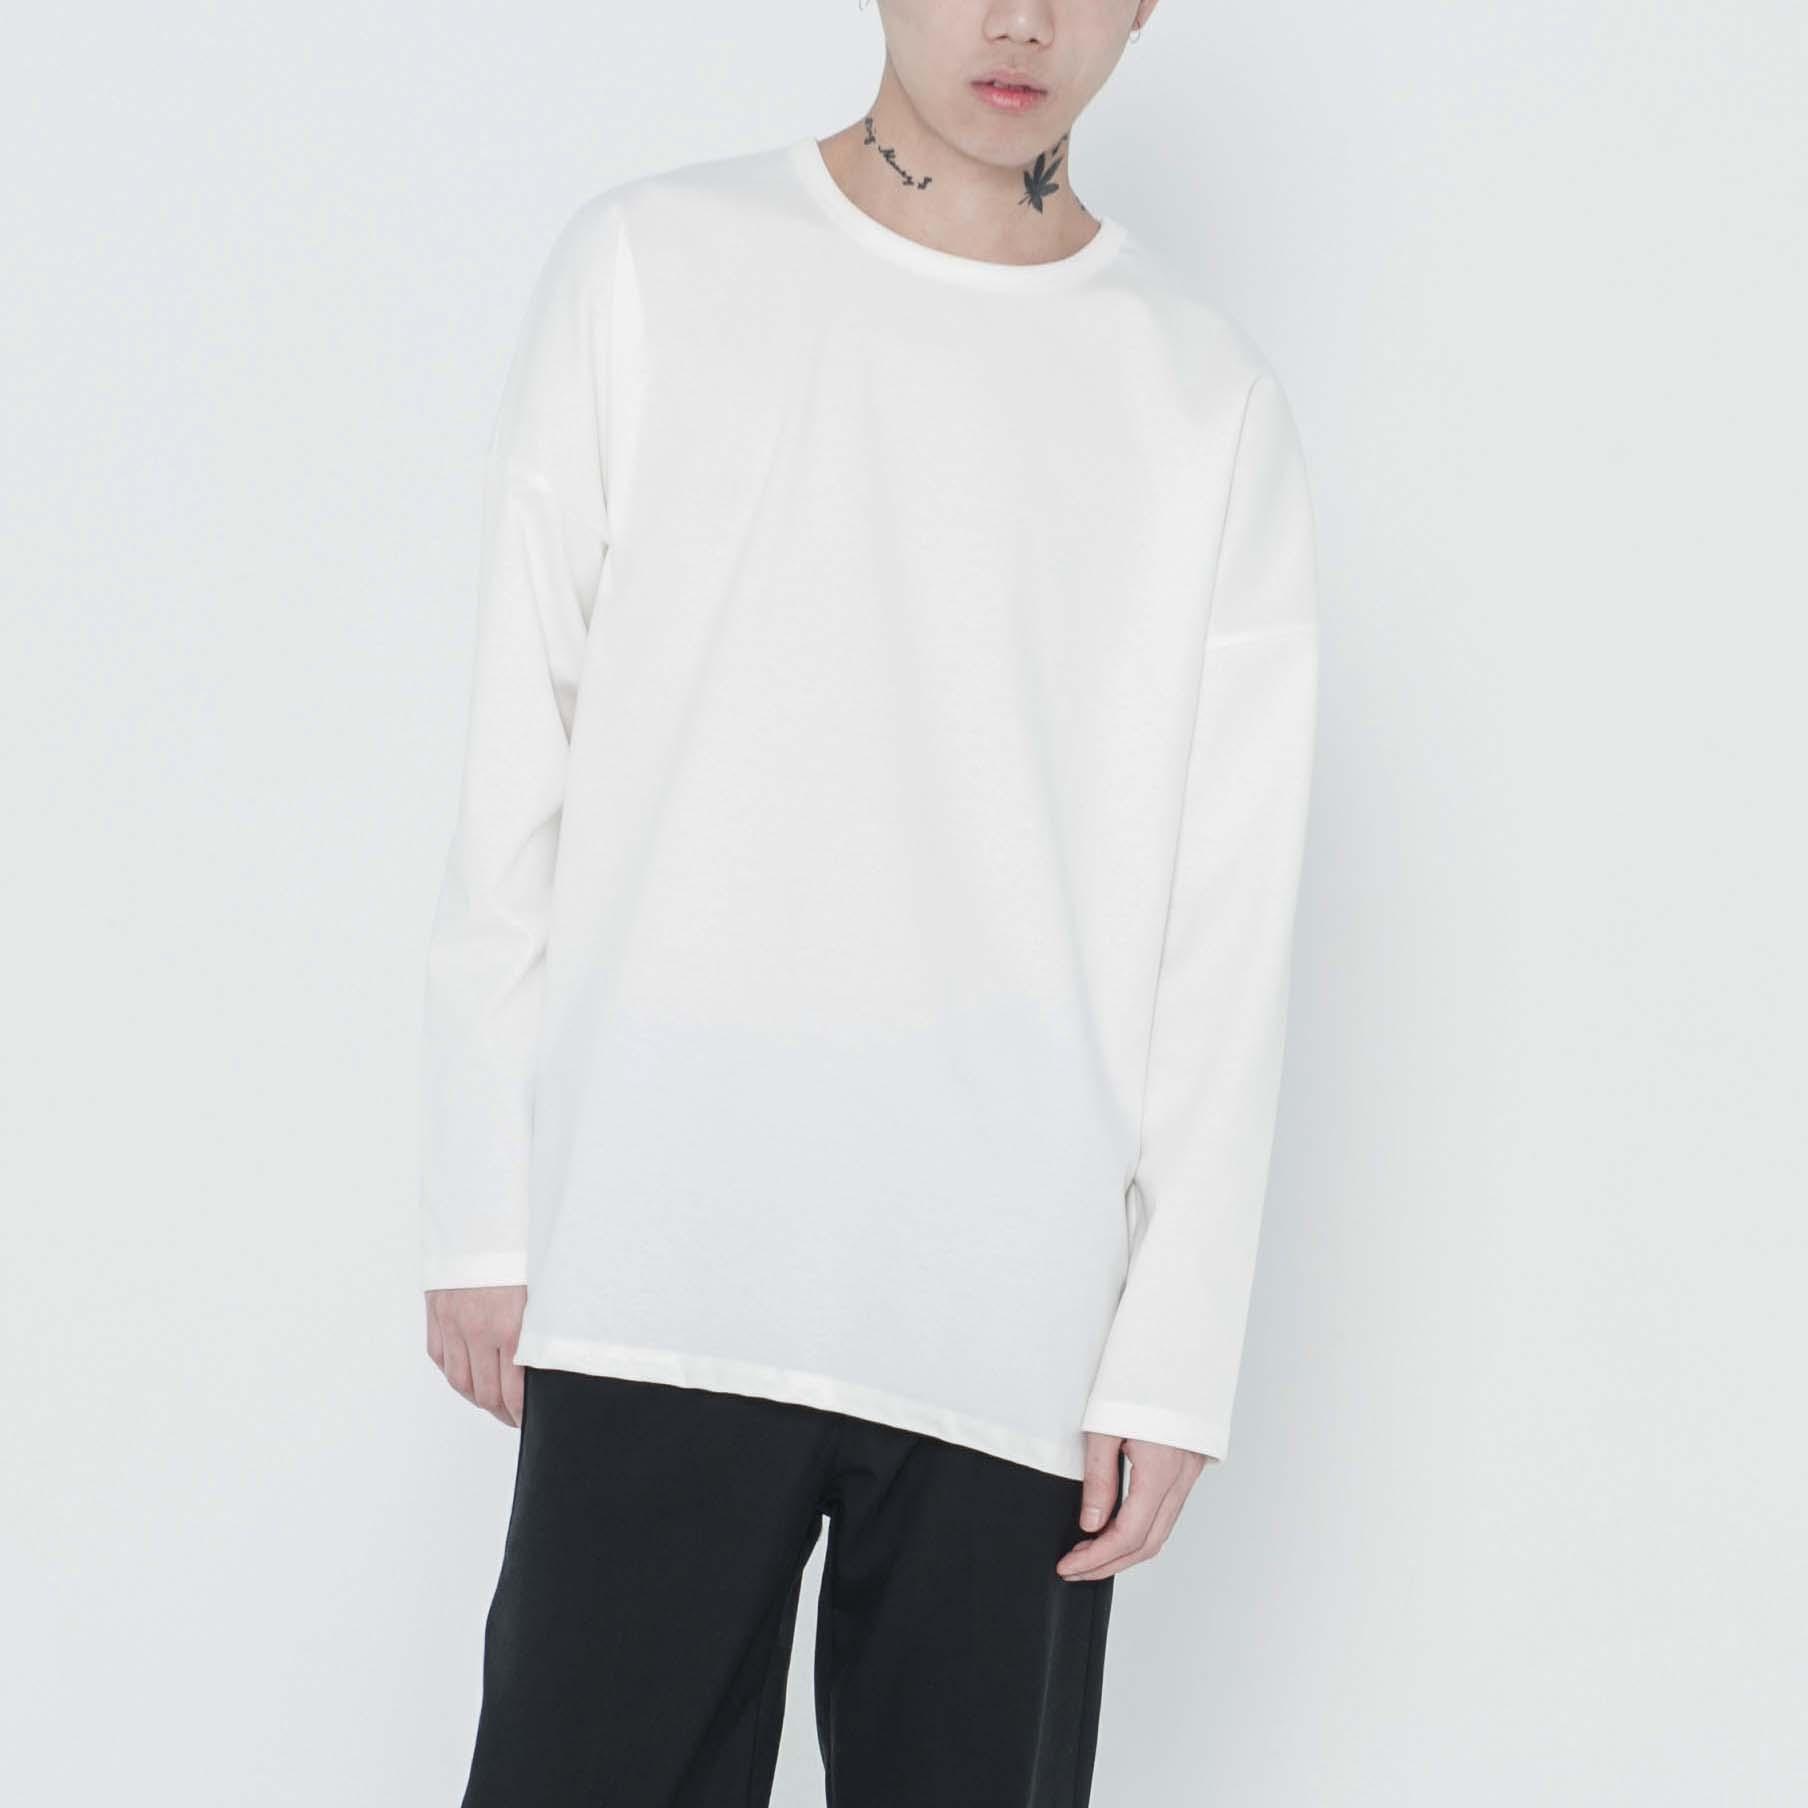 [B1A4 바로 착용]화이트 미니멀 티셔츠